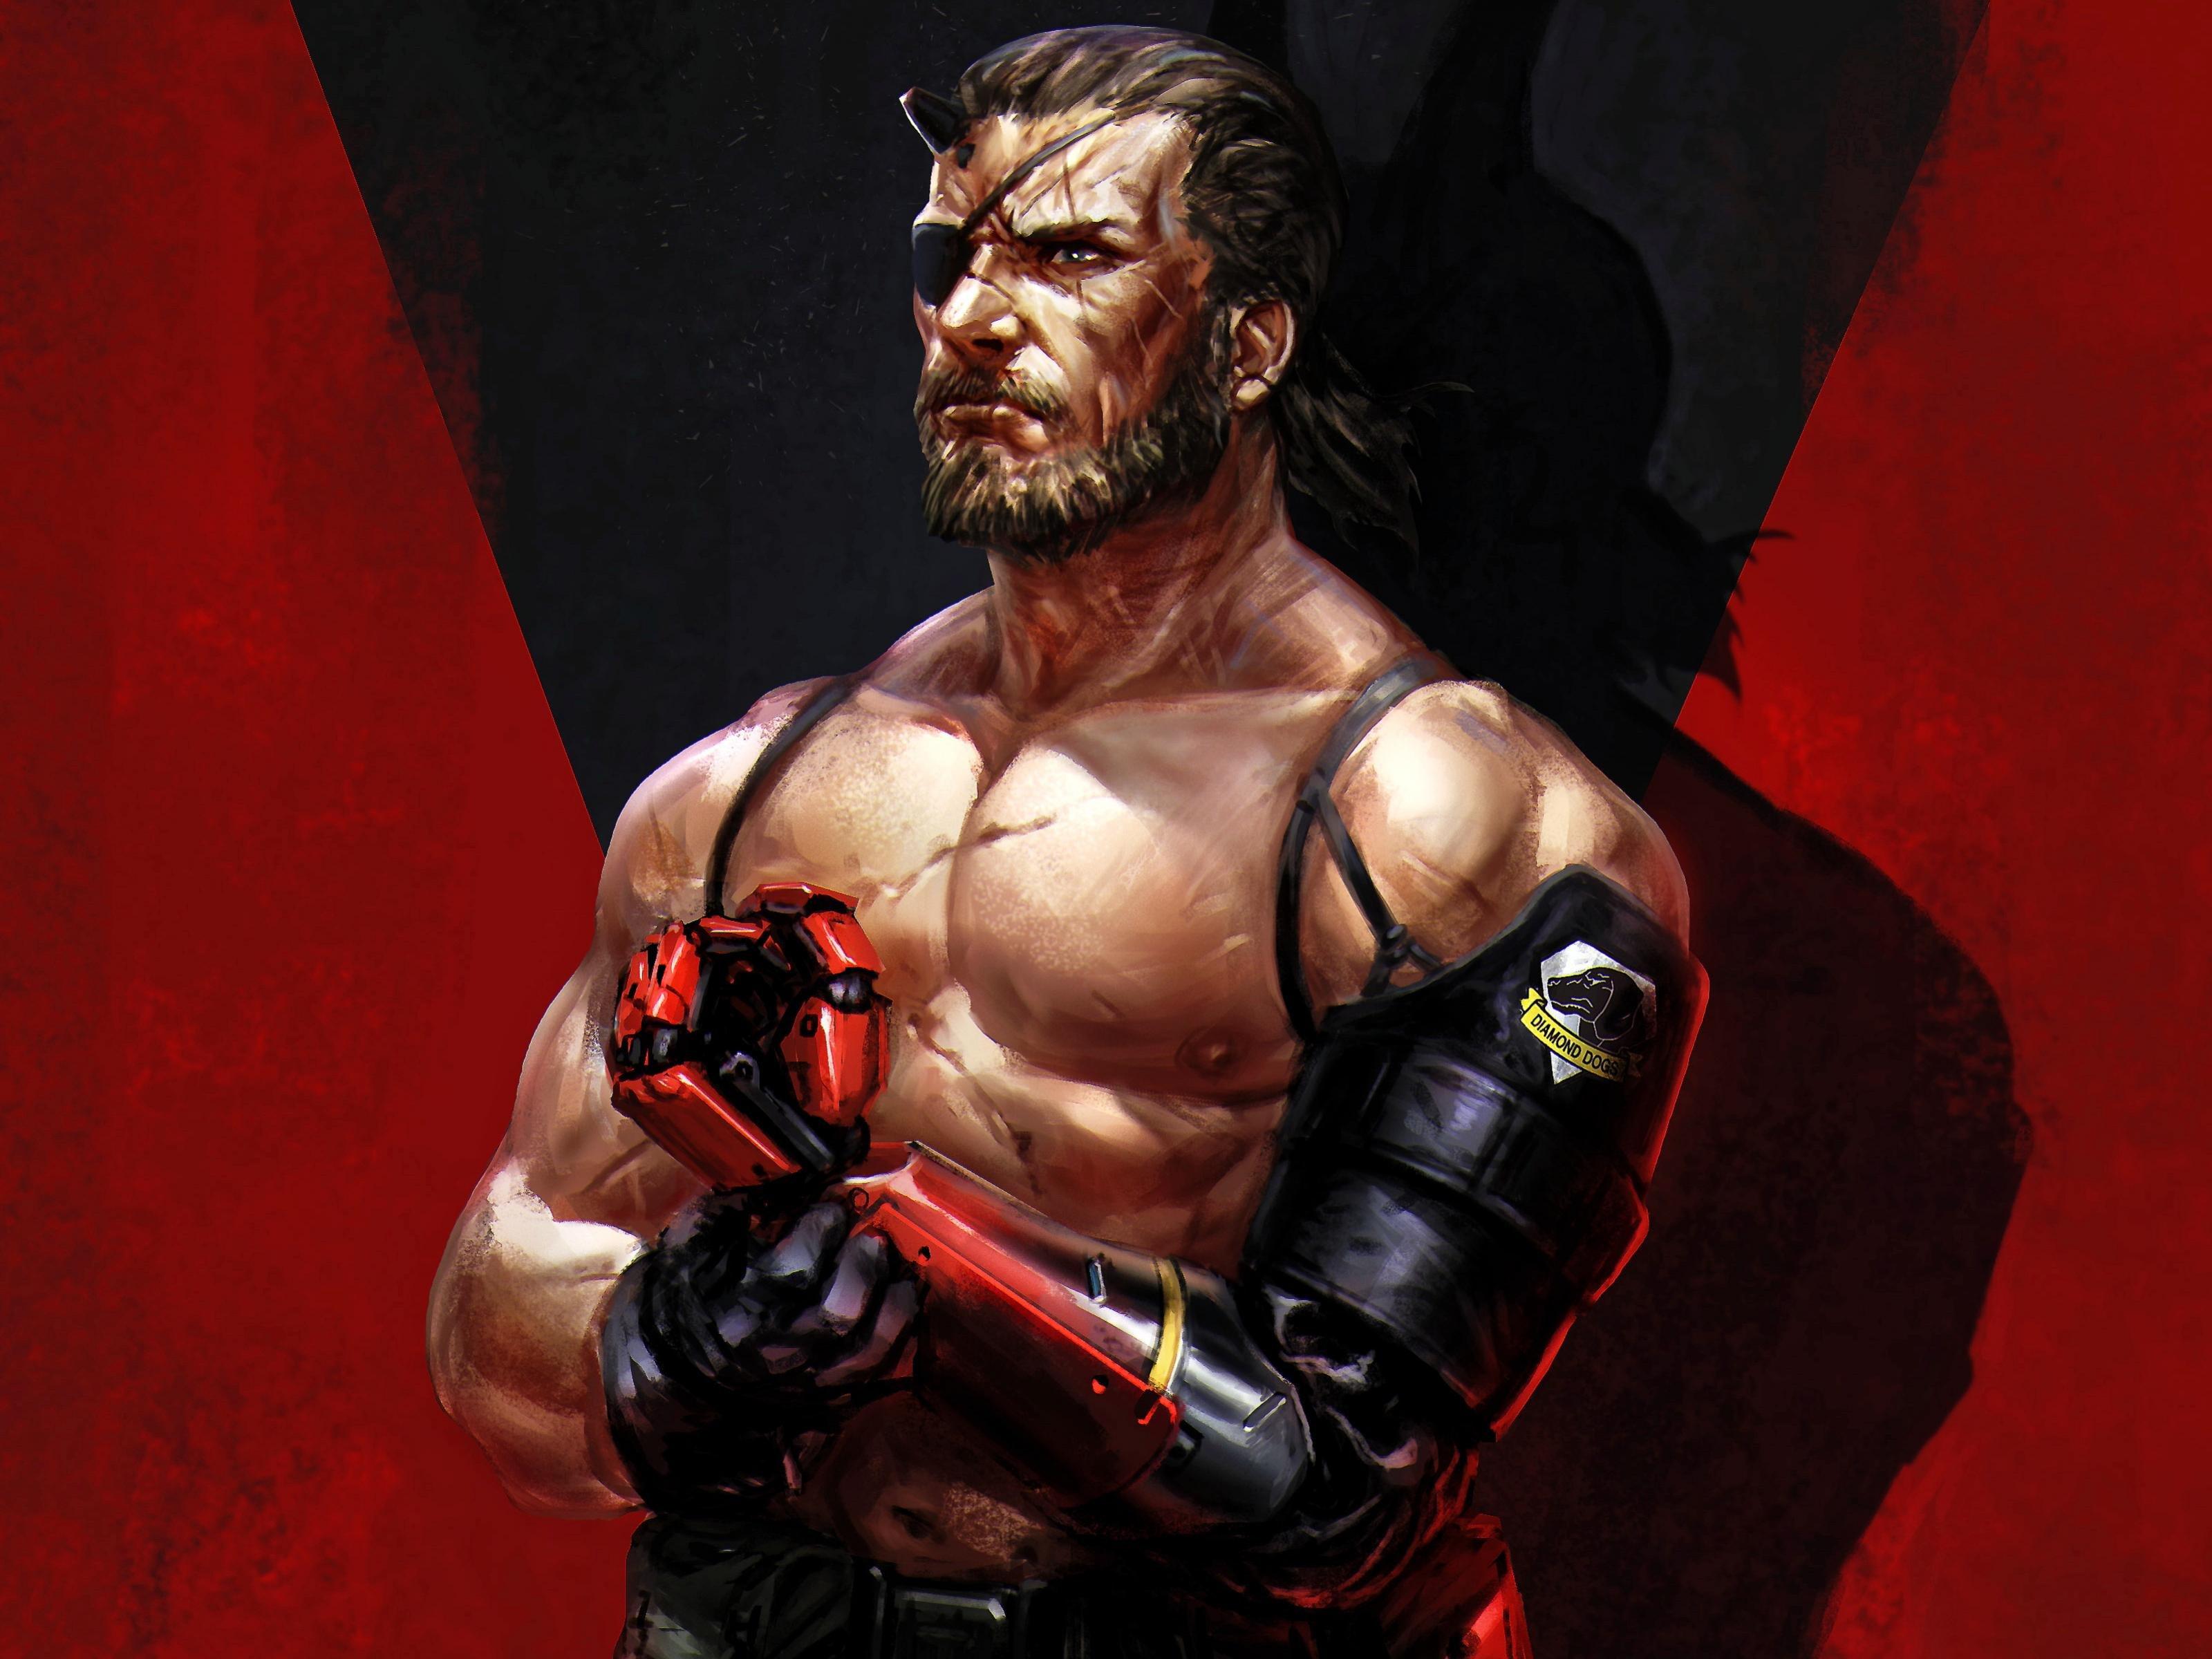 Best Metal Gear Solid 5 V The Phantom Pain Mgsv 5 Wallpaper